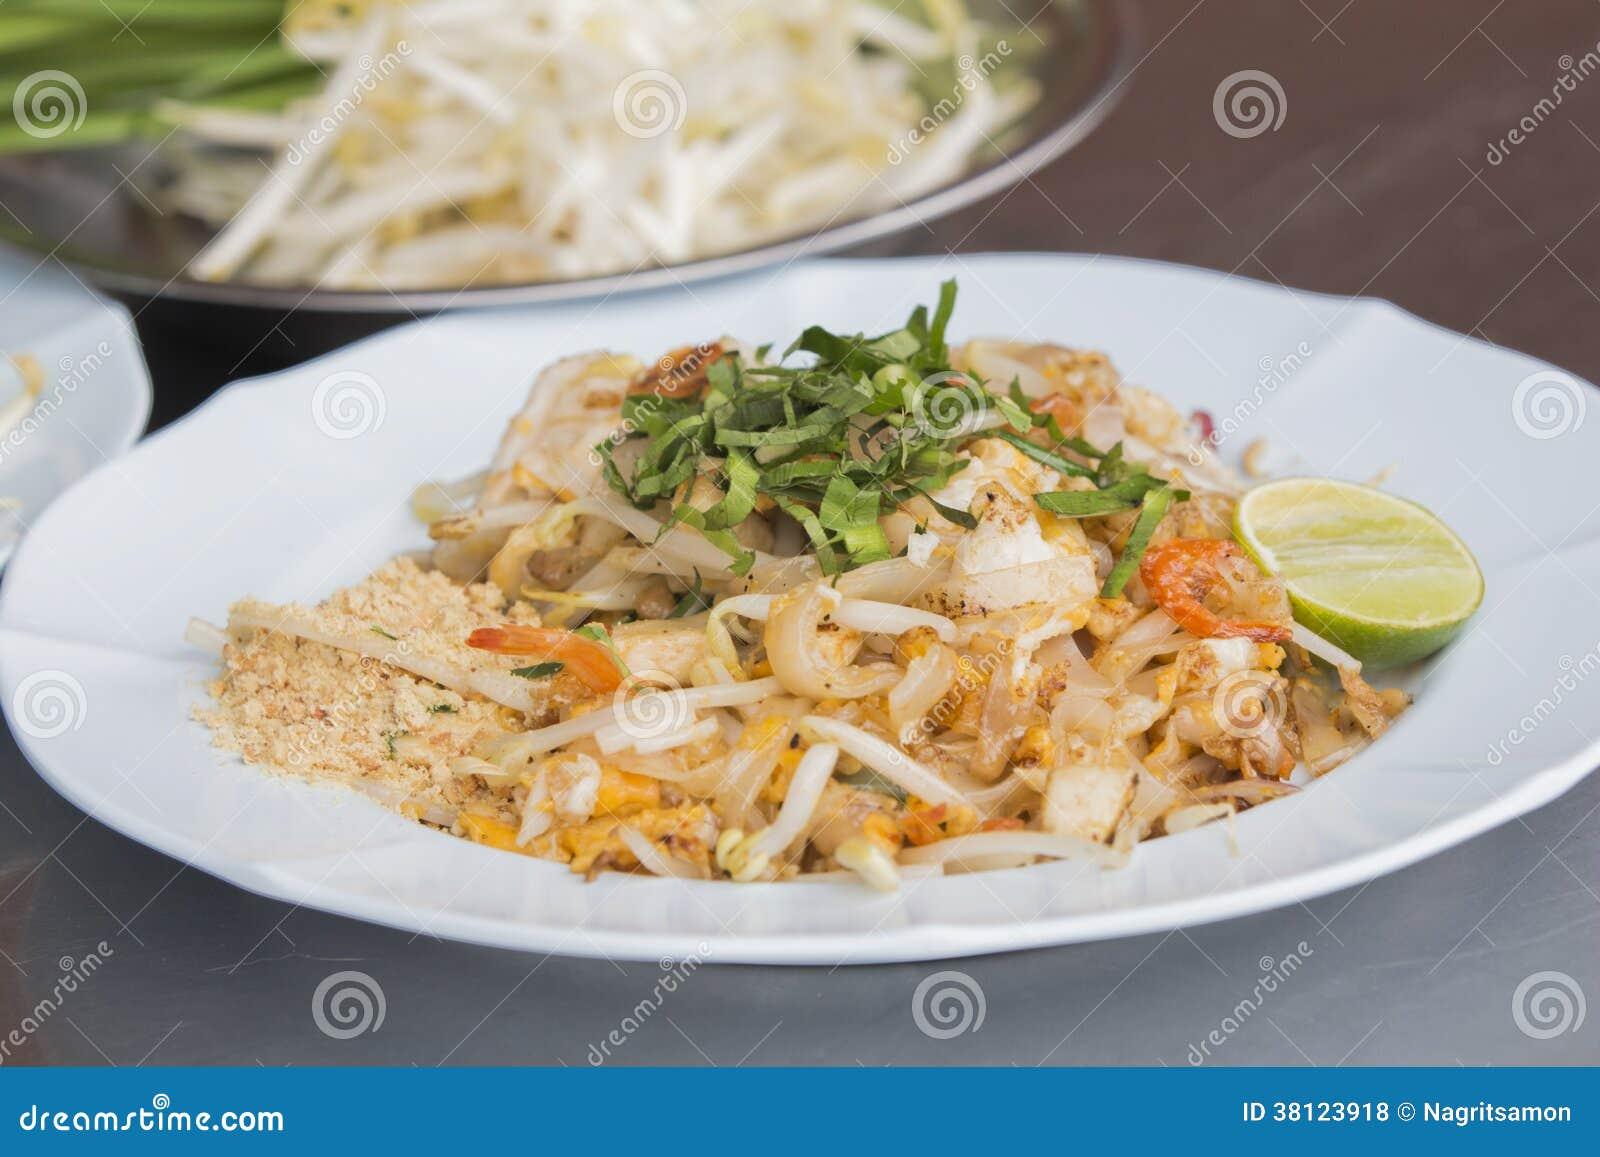 how to prepare rice sticks